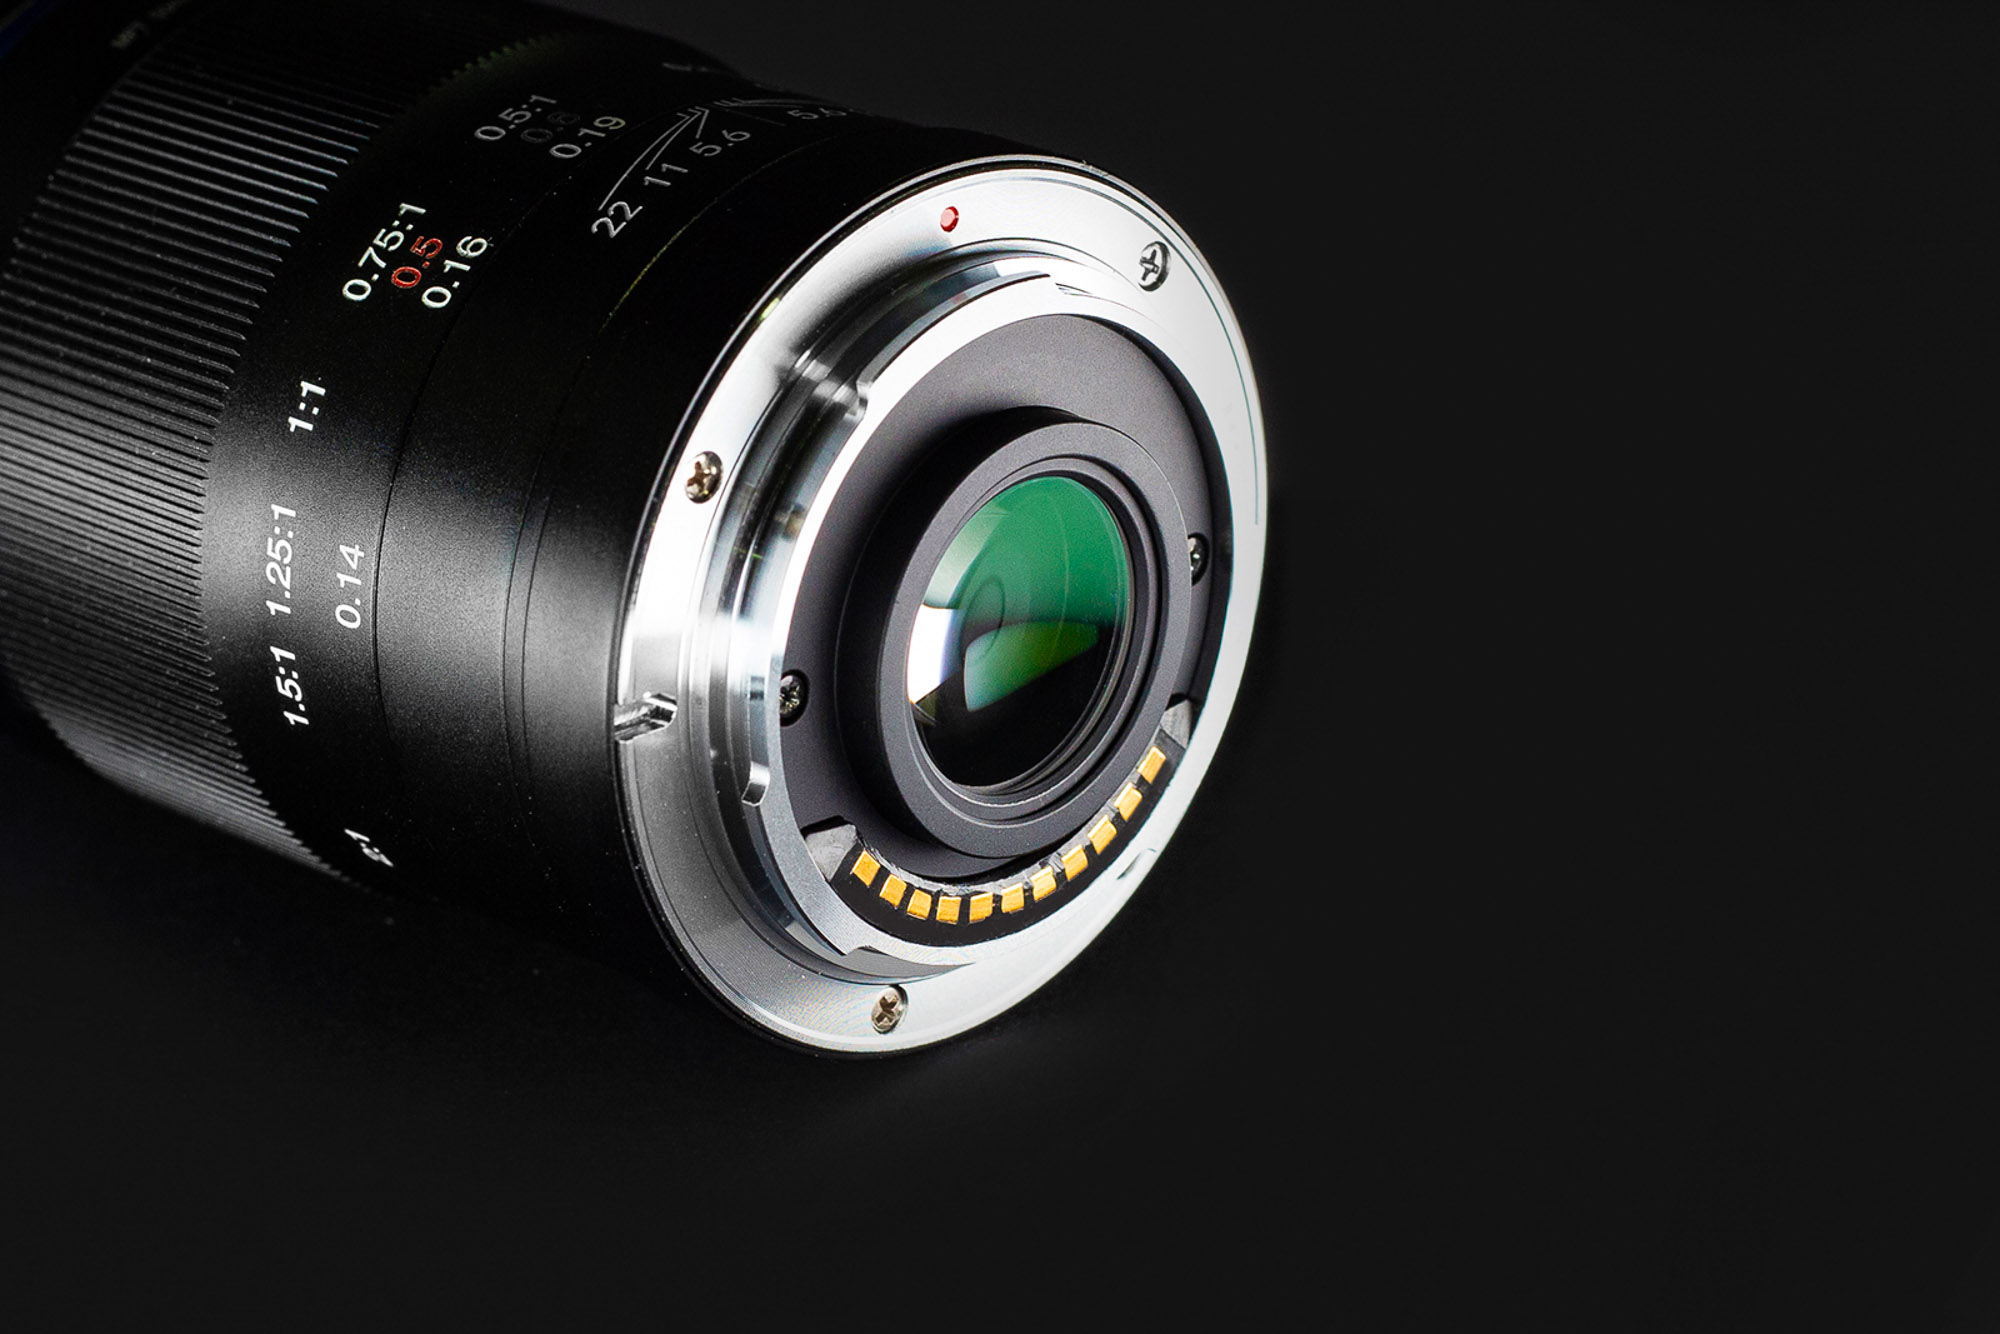 Venus Optics Laowa 50mm f/2.8 lens for Micro 4/3 on black background